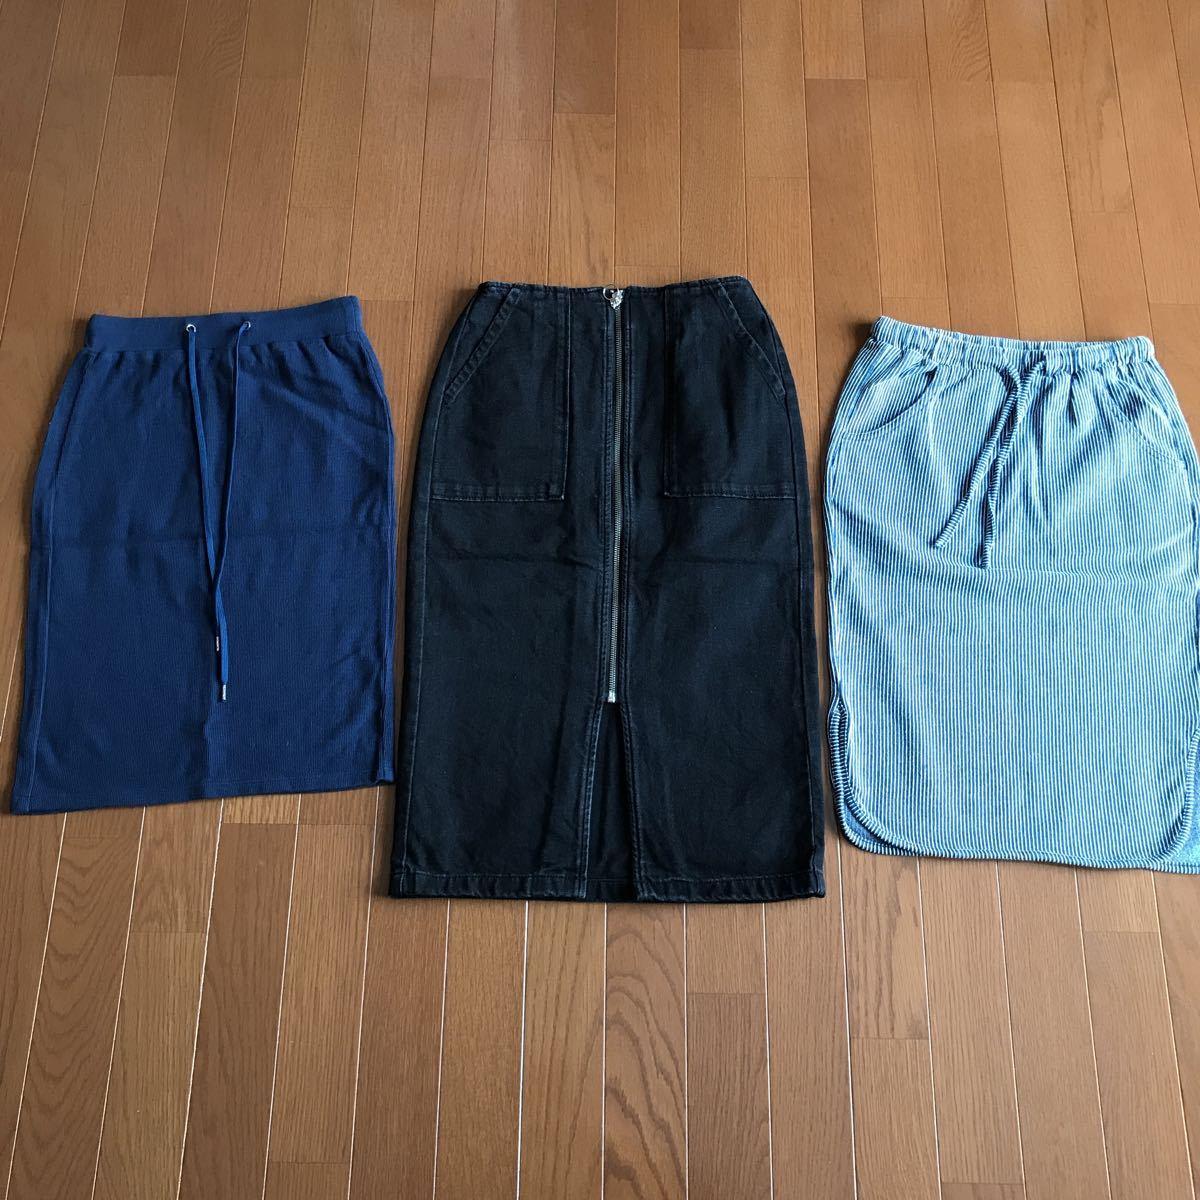 GUスカート3枚セット 全てSサイズ_画像1